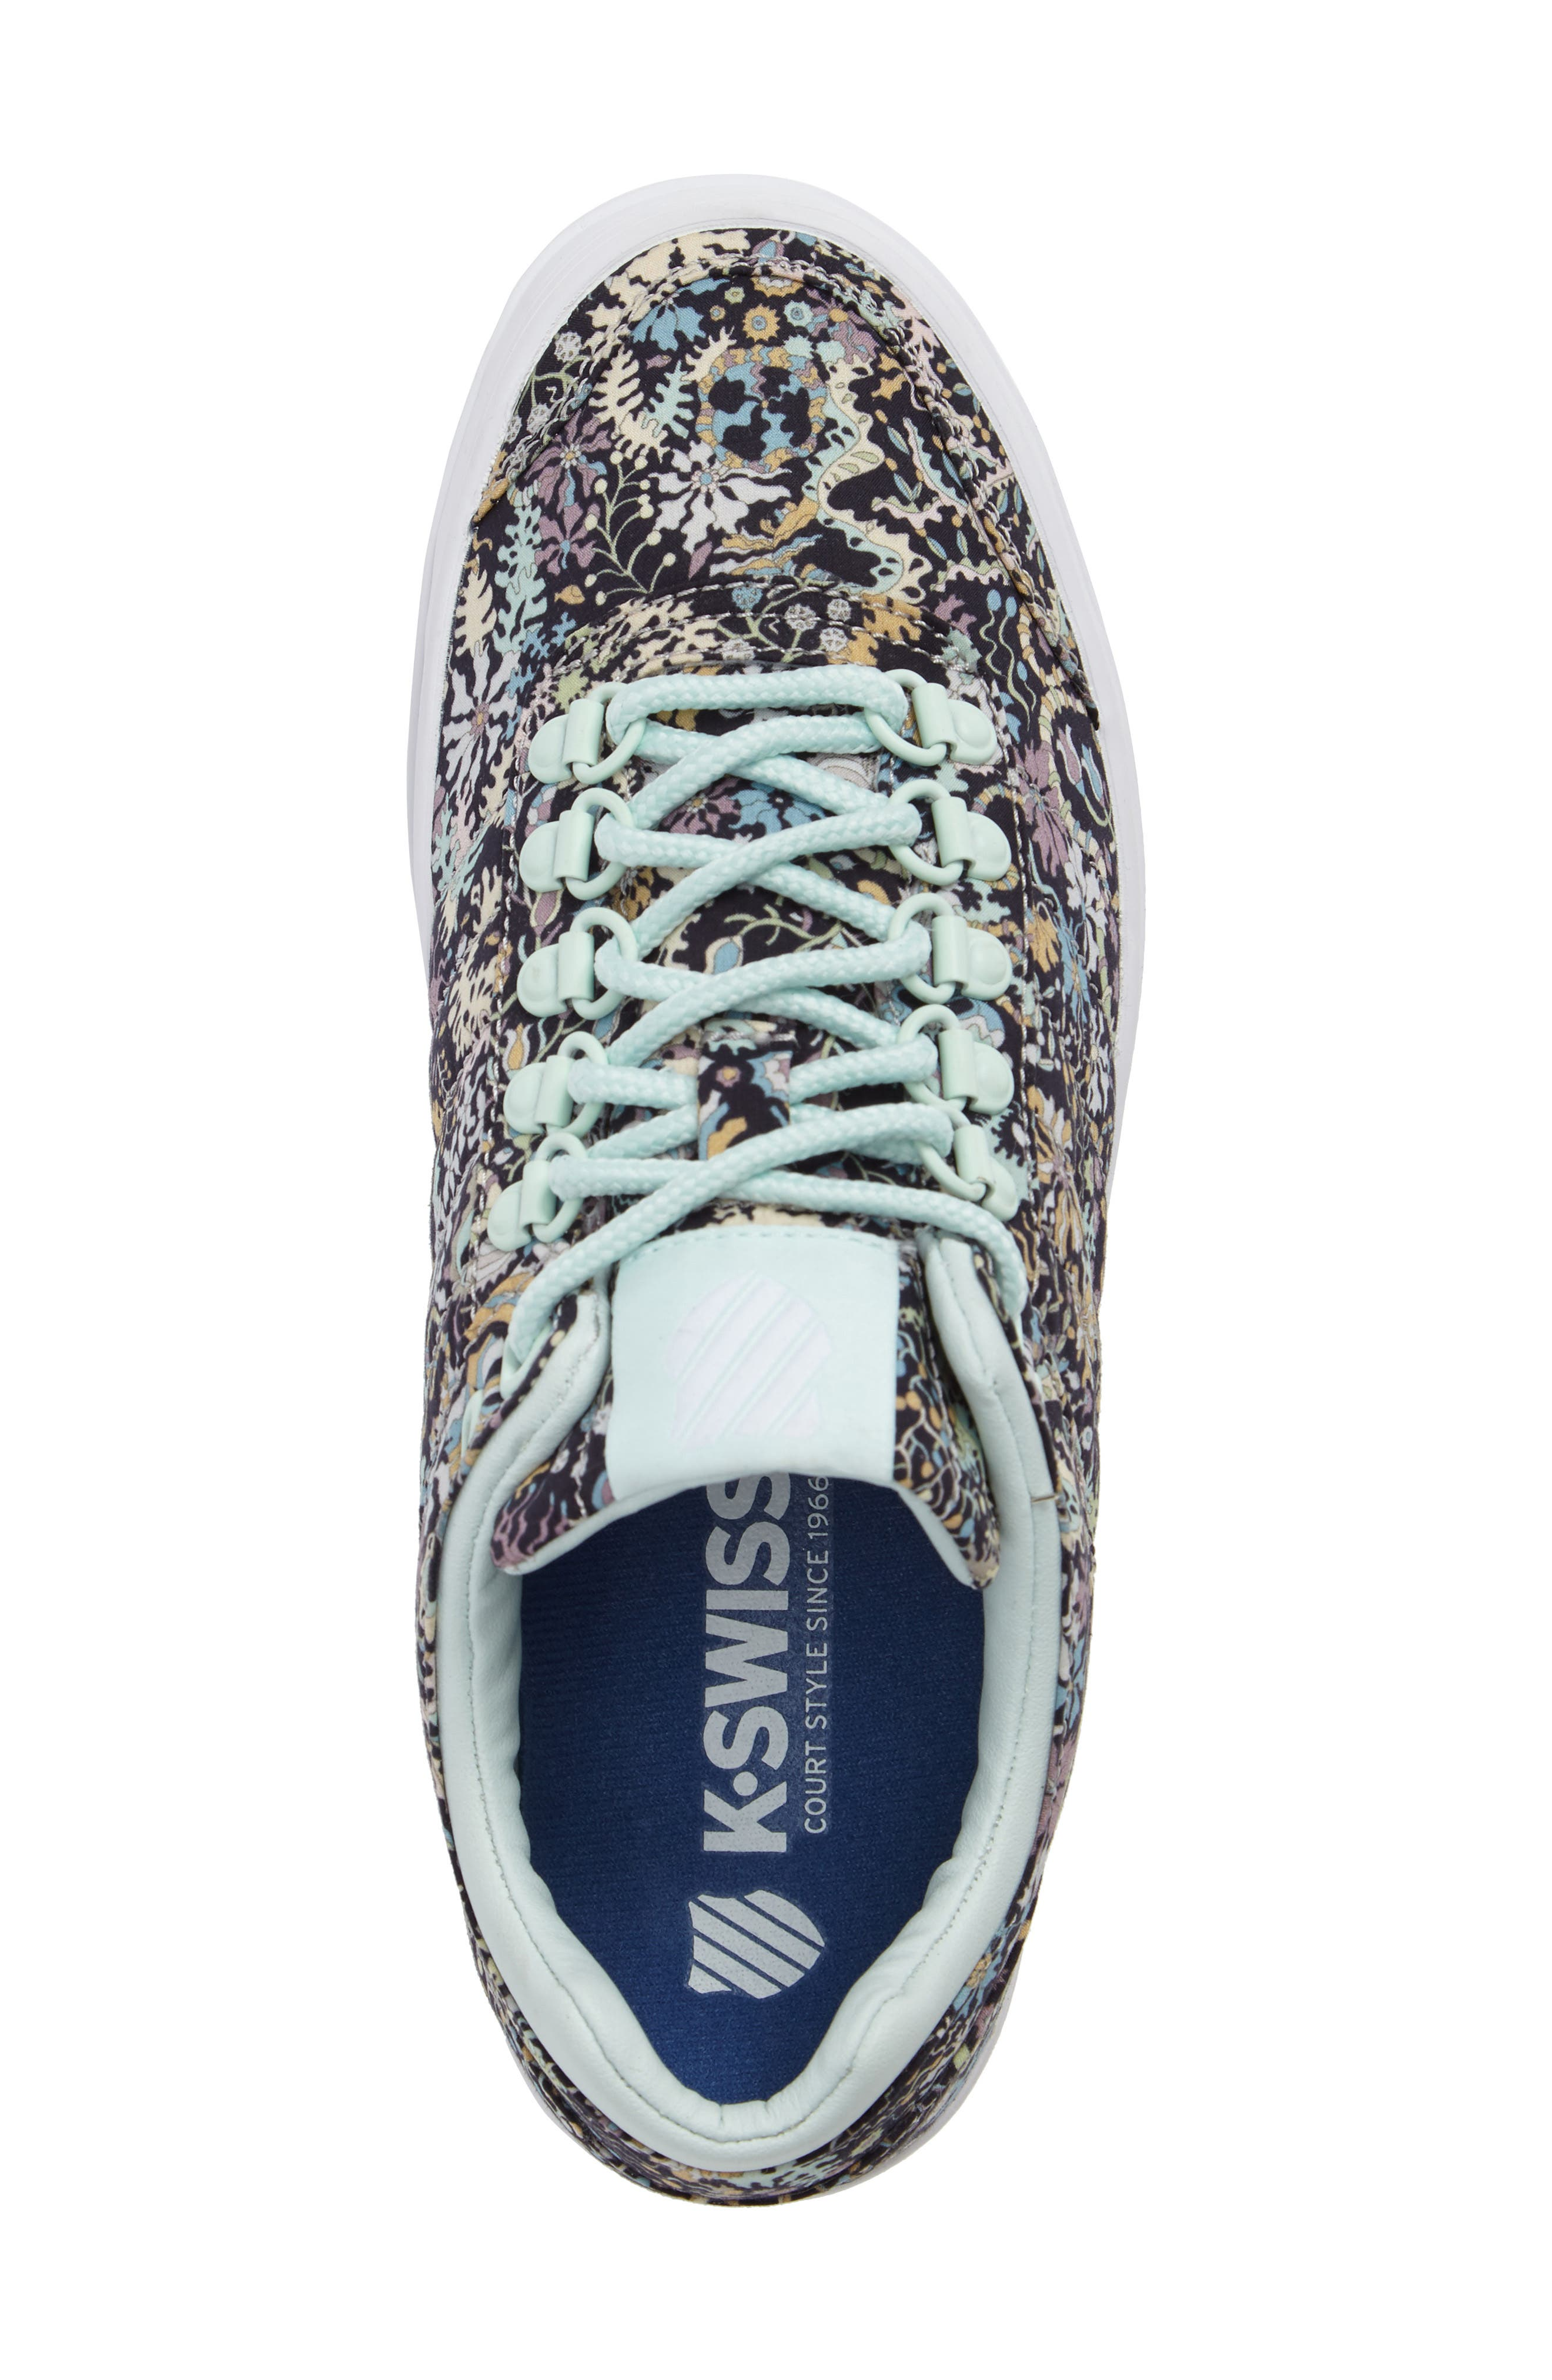 Gstaad Flatform Sneaker,                             Alternate thumbnail 5, color,                             040